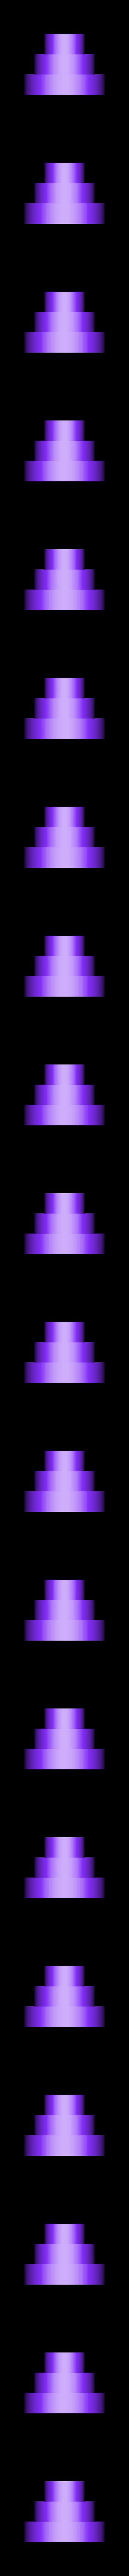 poid.stl Download free STL file Zizi Dumbbell / Dumbbell Zizi Dumbbell • 3D printing template, Aneton3D